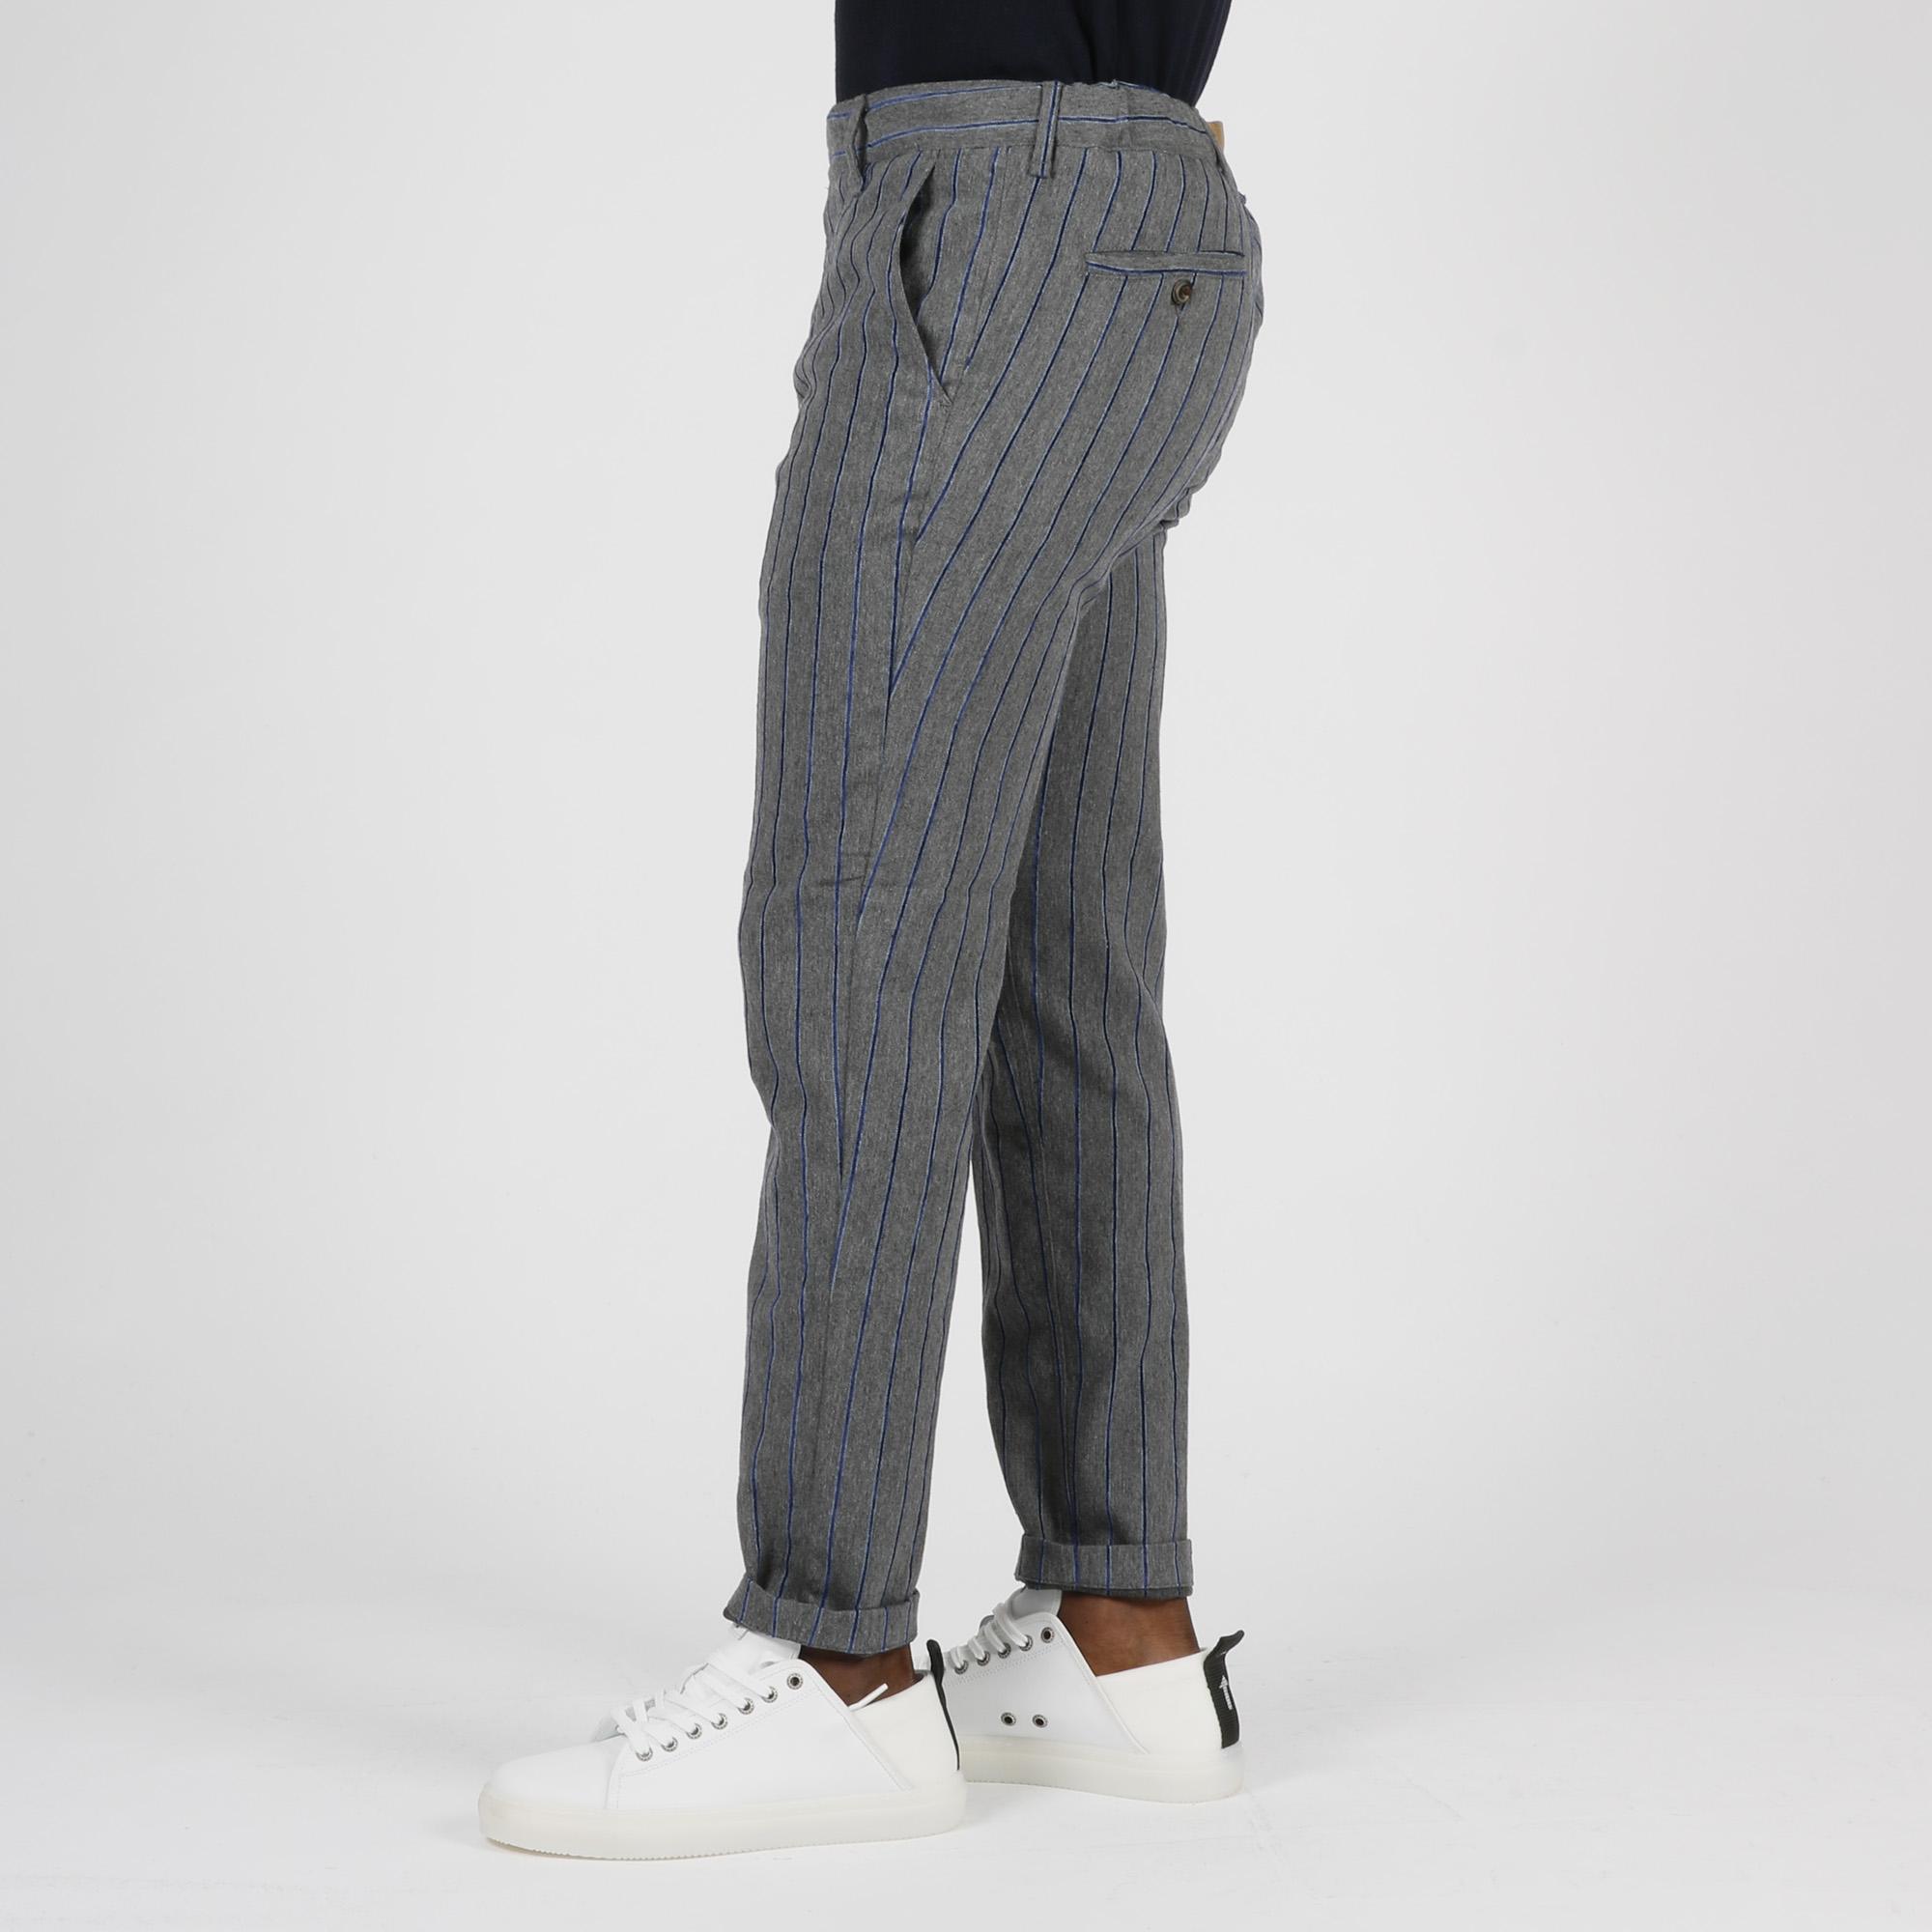 Pantalone gessato - Grigio/blu